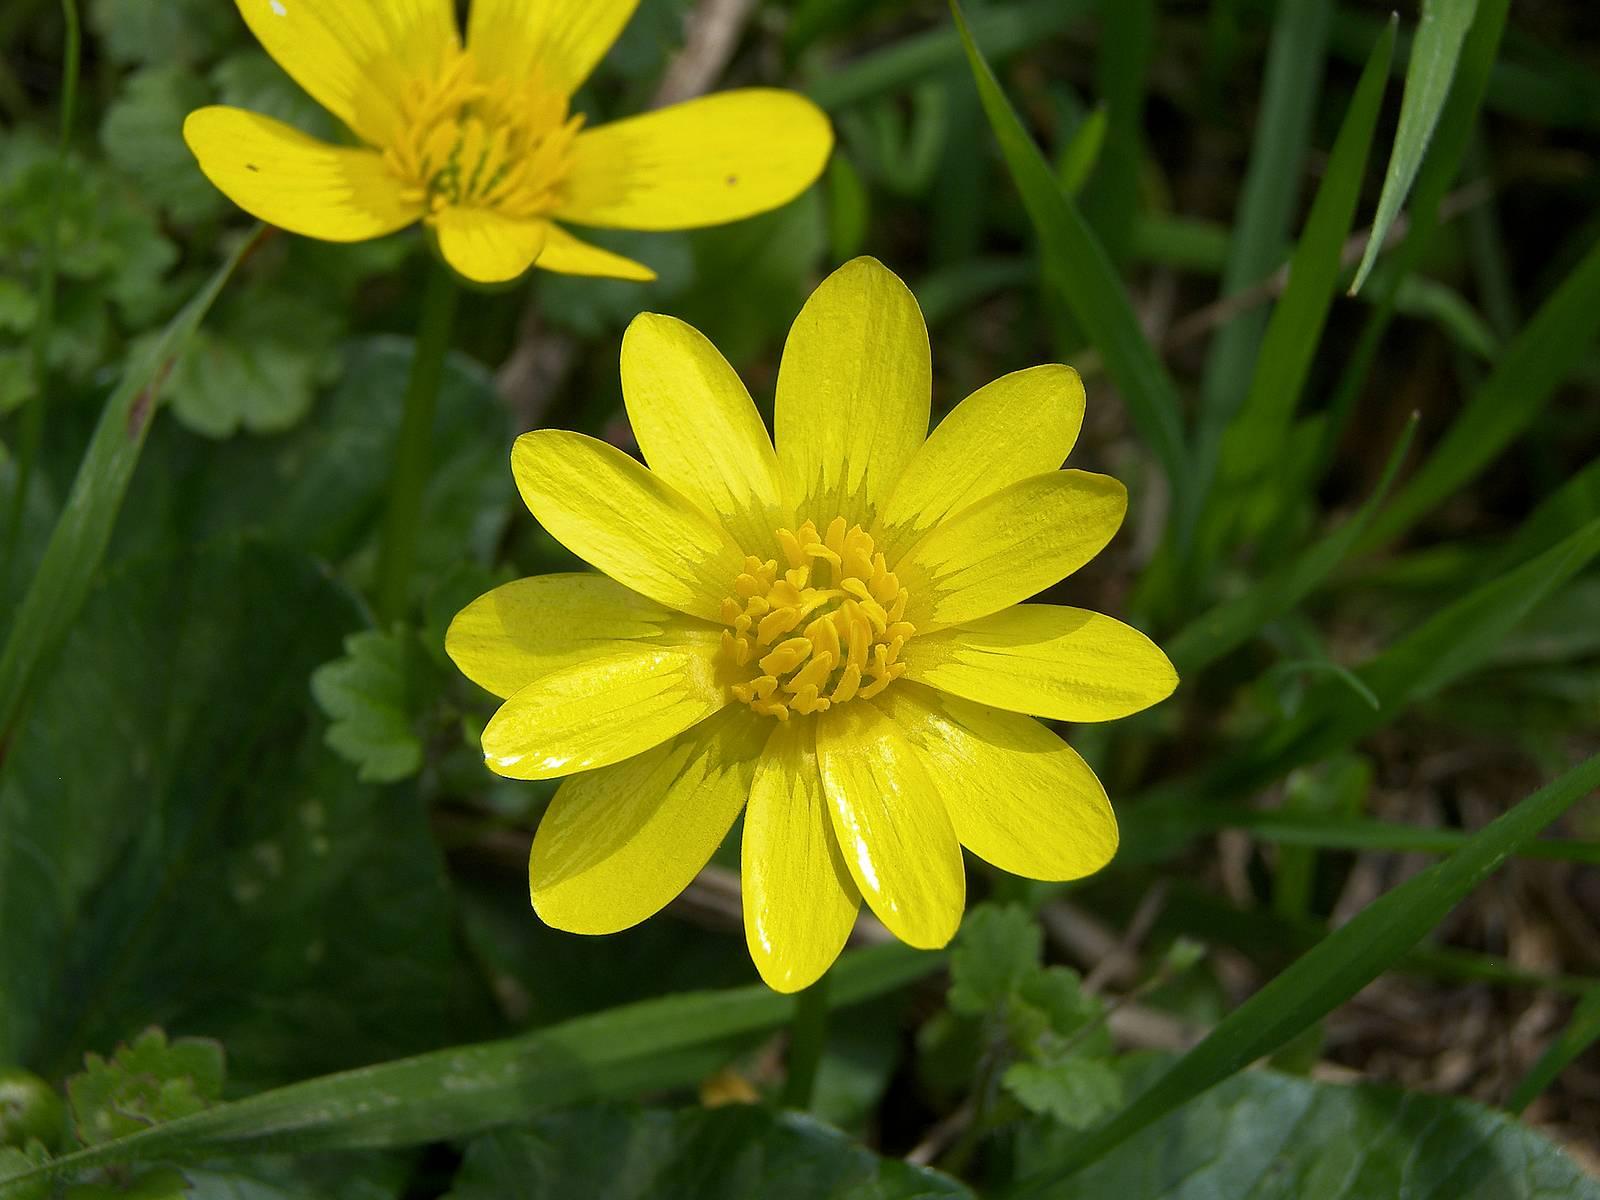 Flower Picture: Daisy Flower # 1